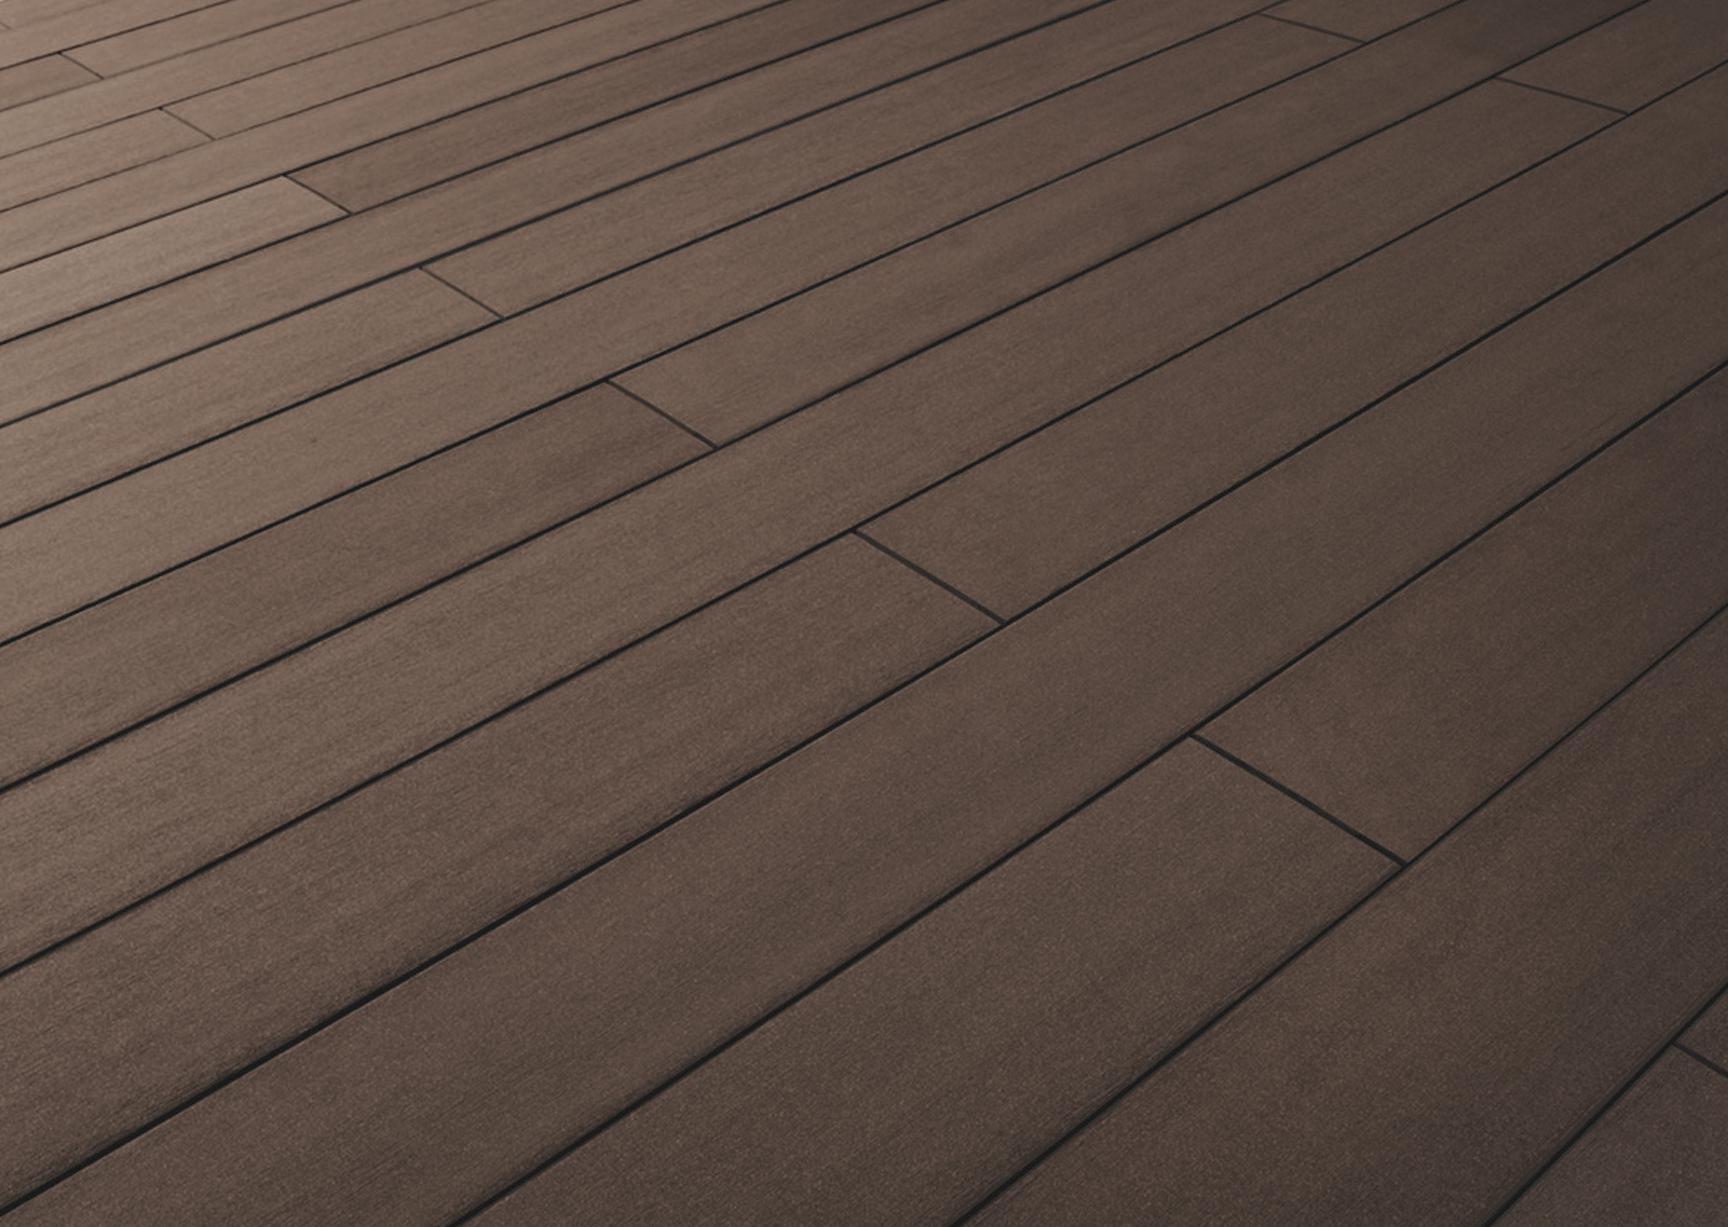 terrafina-composite-plain-decking-plain-redbrown-surface-finish